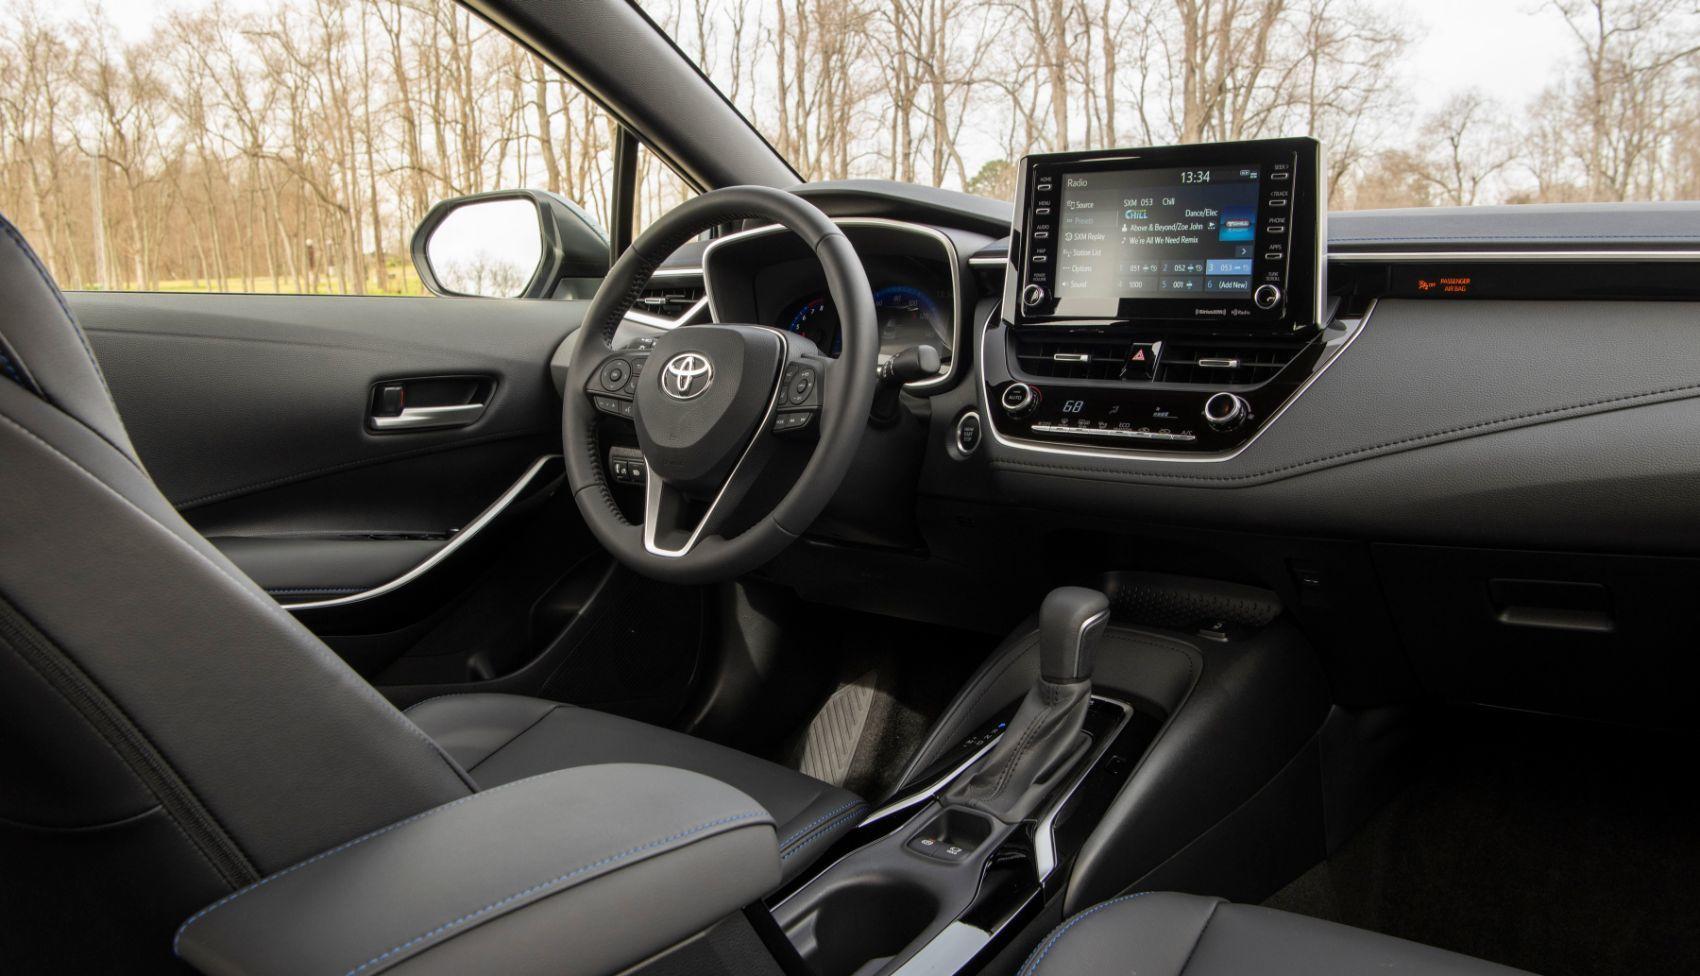 2021 Toyota Corolla XSE interior layout.